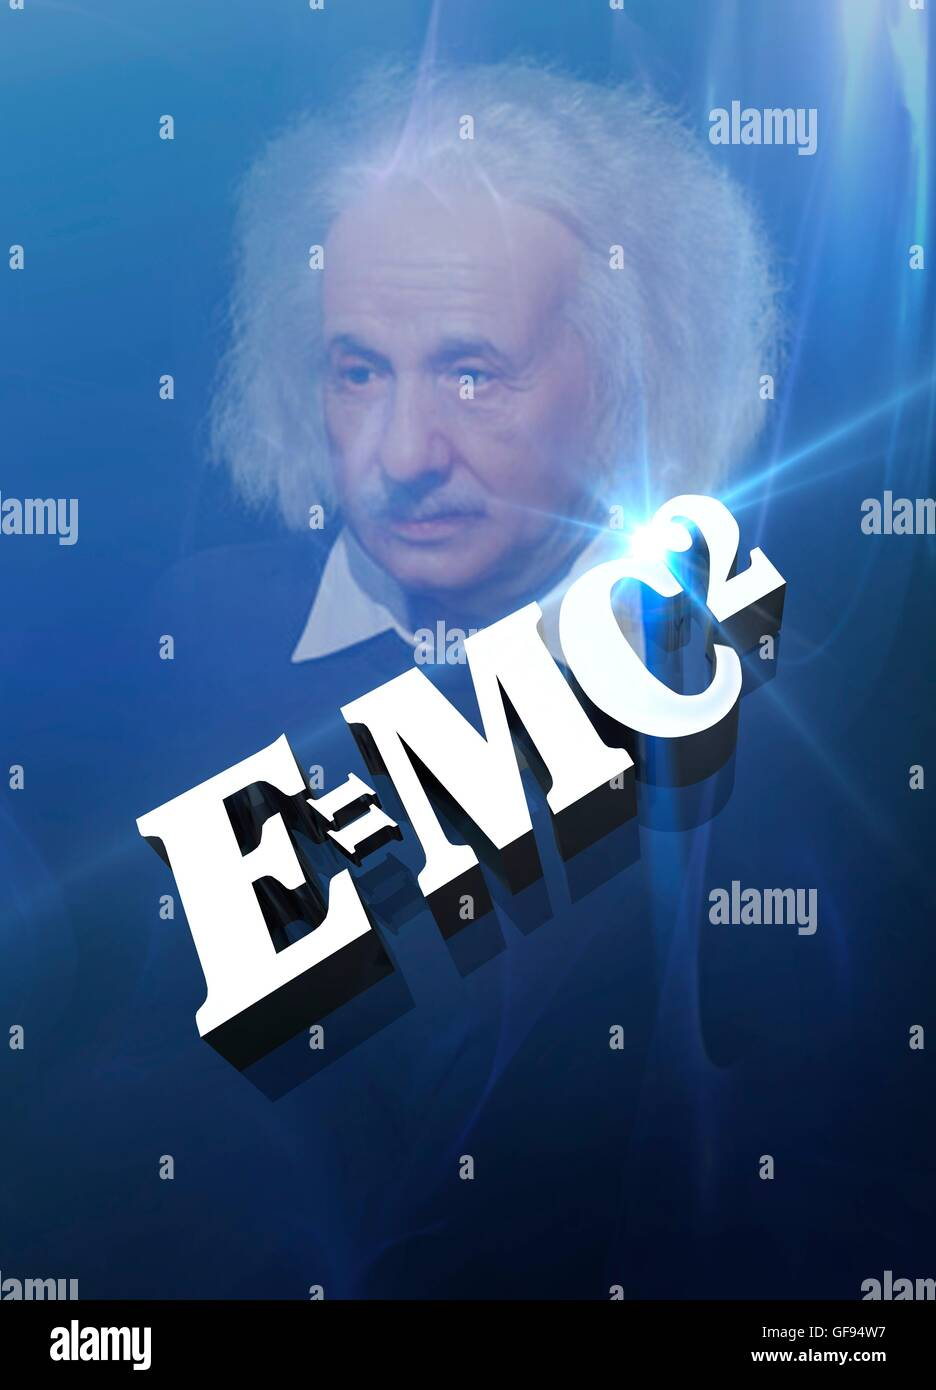 Einstein's formula, conceptual illustration. - Stock Image